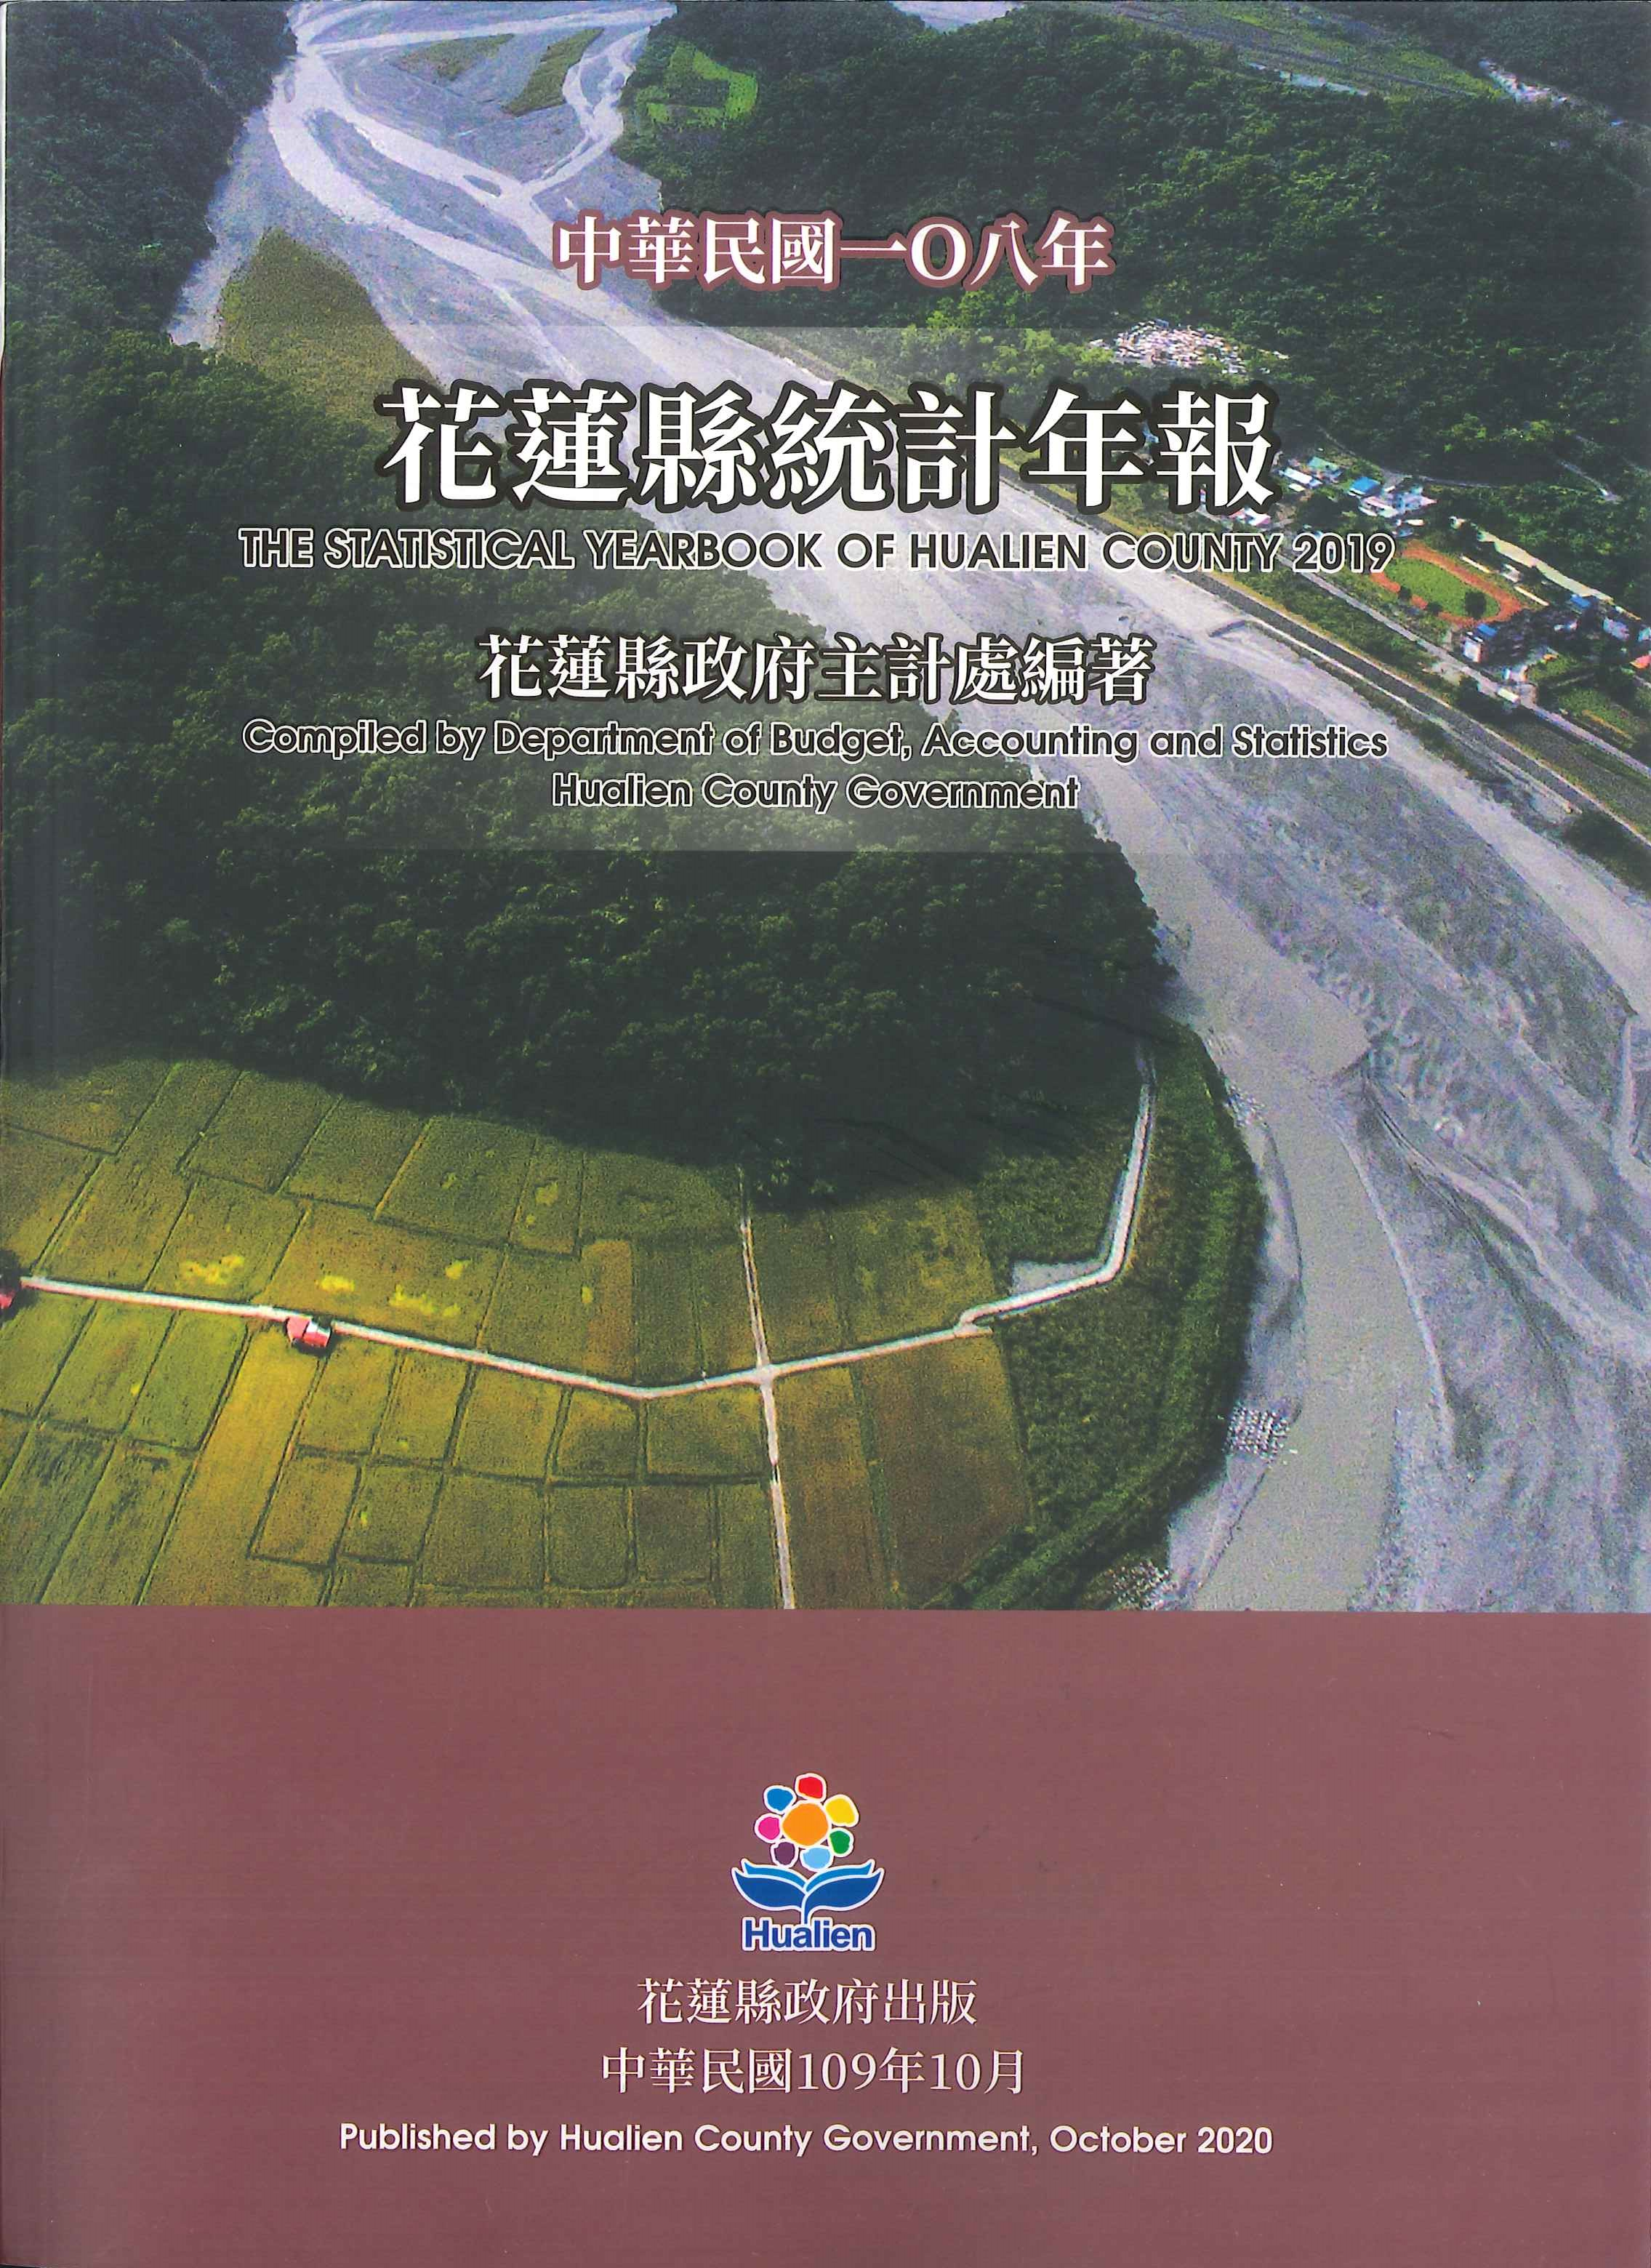 花蓮縣統計年報.中華民國108年=The statistical yearbook of Hualien County